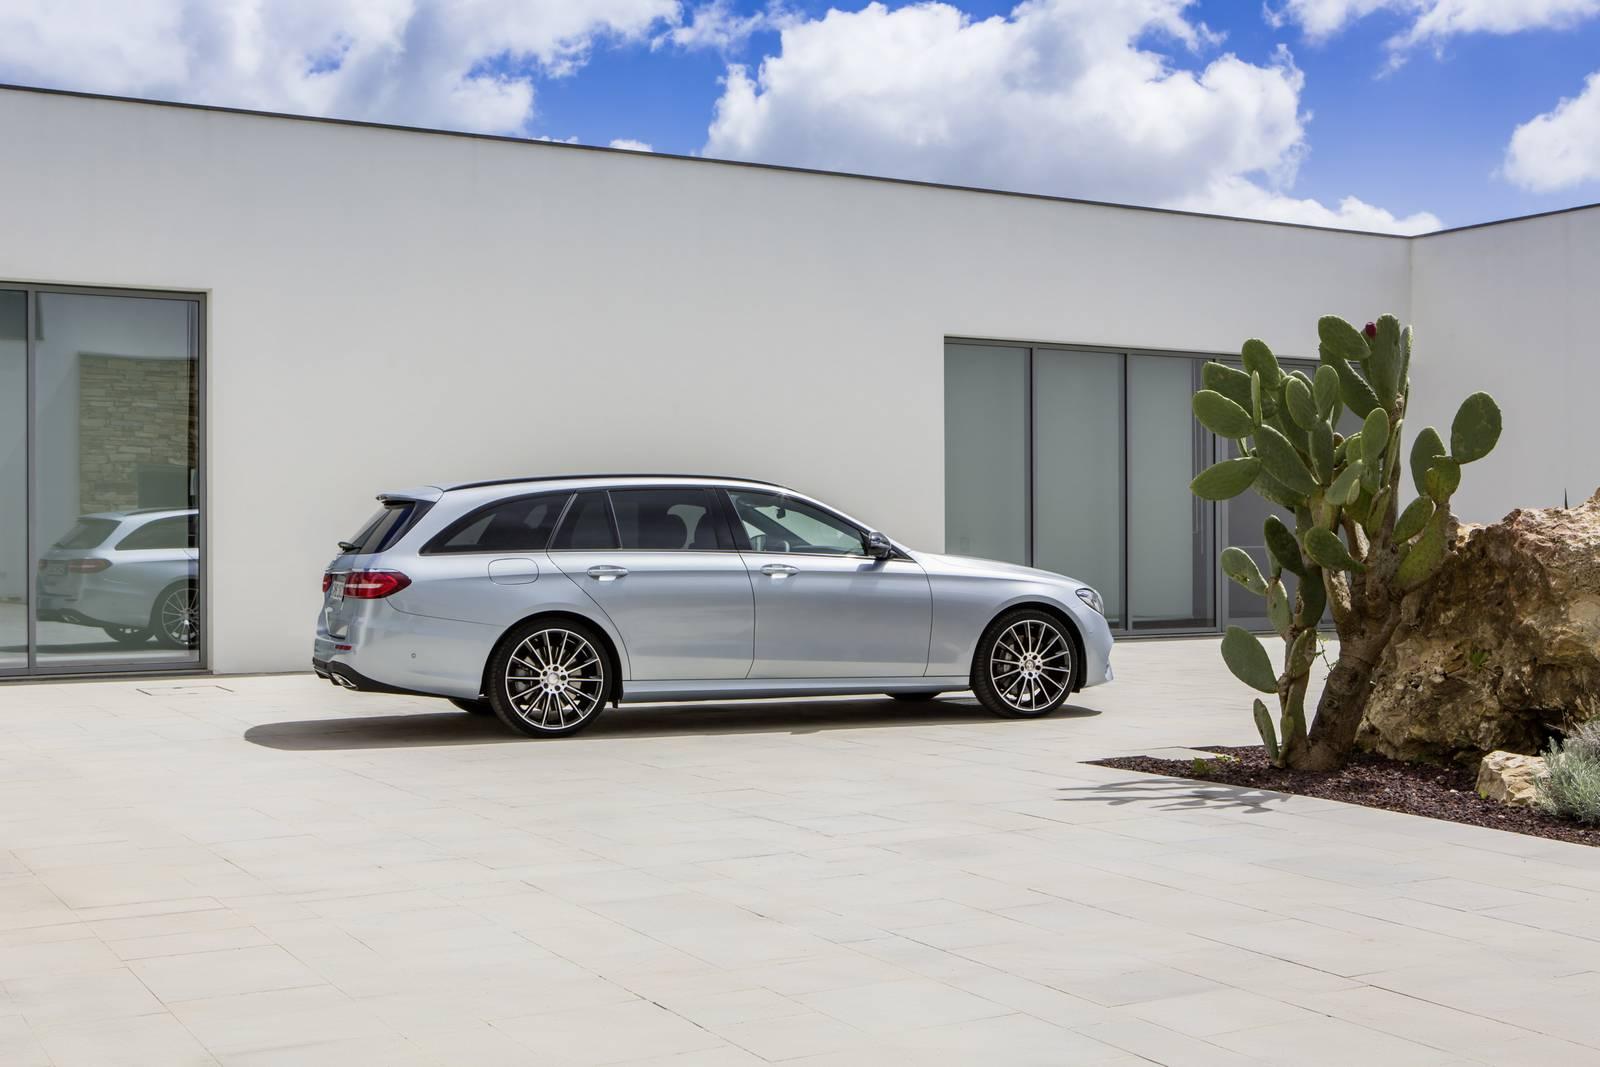 http://gtspirit.com/wp-content/uploads/2016/06/Mercedes-Benz-E43-Estate-31.jpg